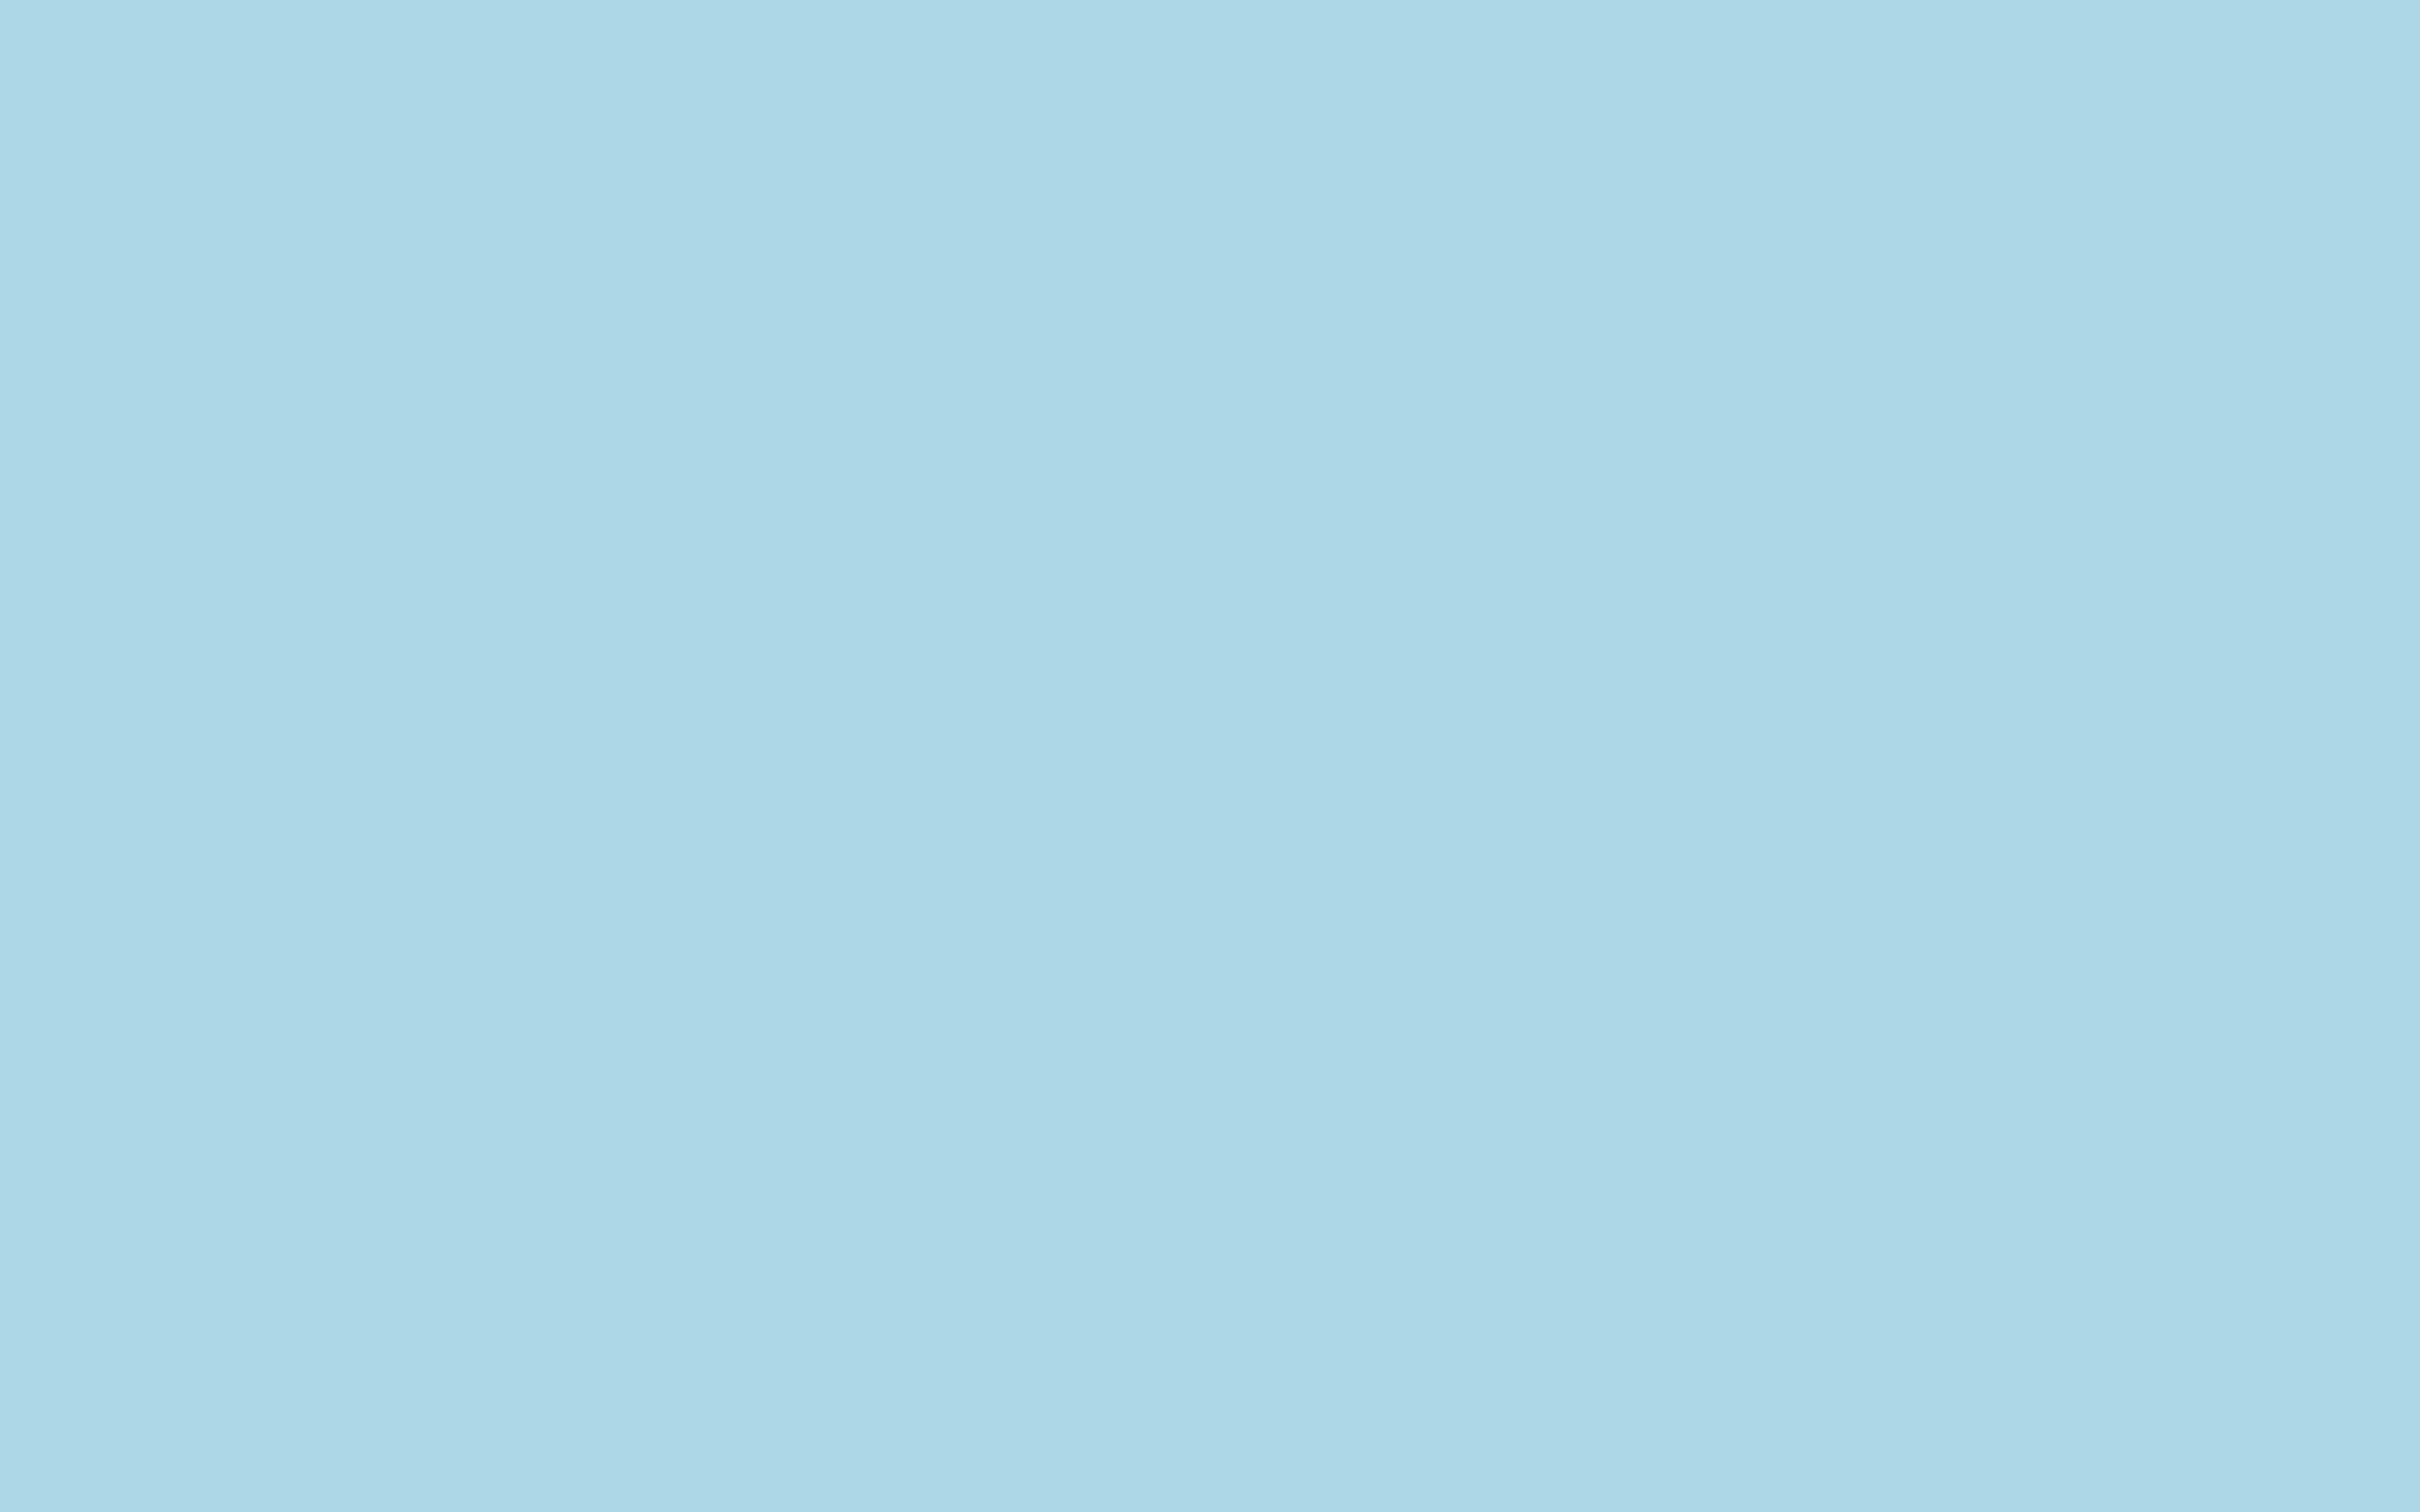 Blue Color Background Wallpaper - WallpaperSafari Plain Light Blue Wallpapers